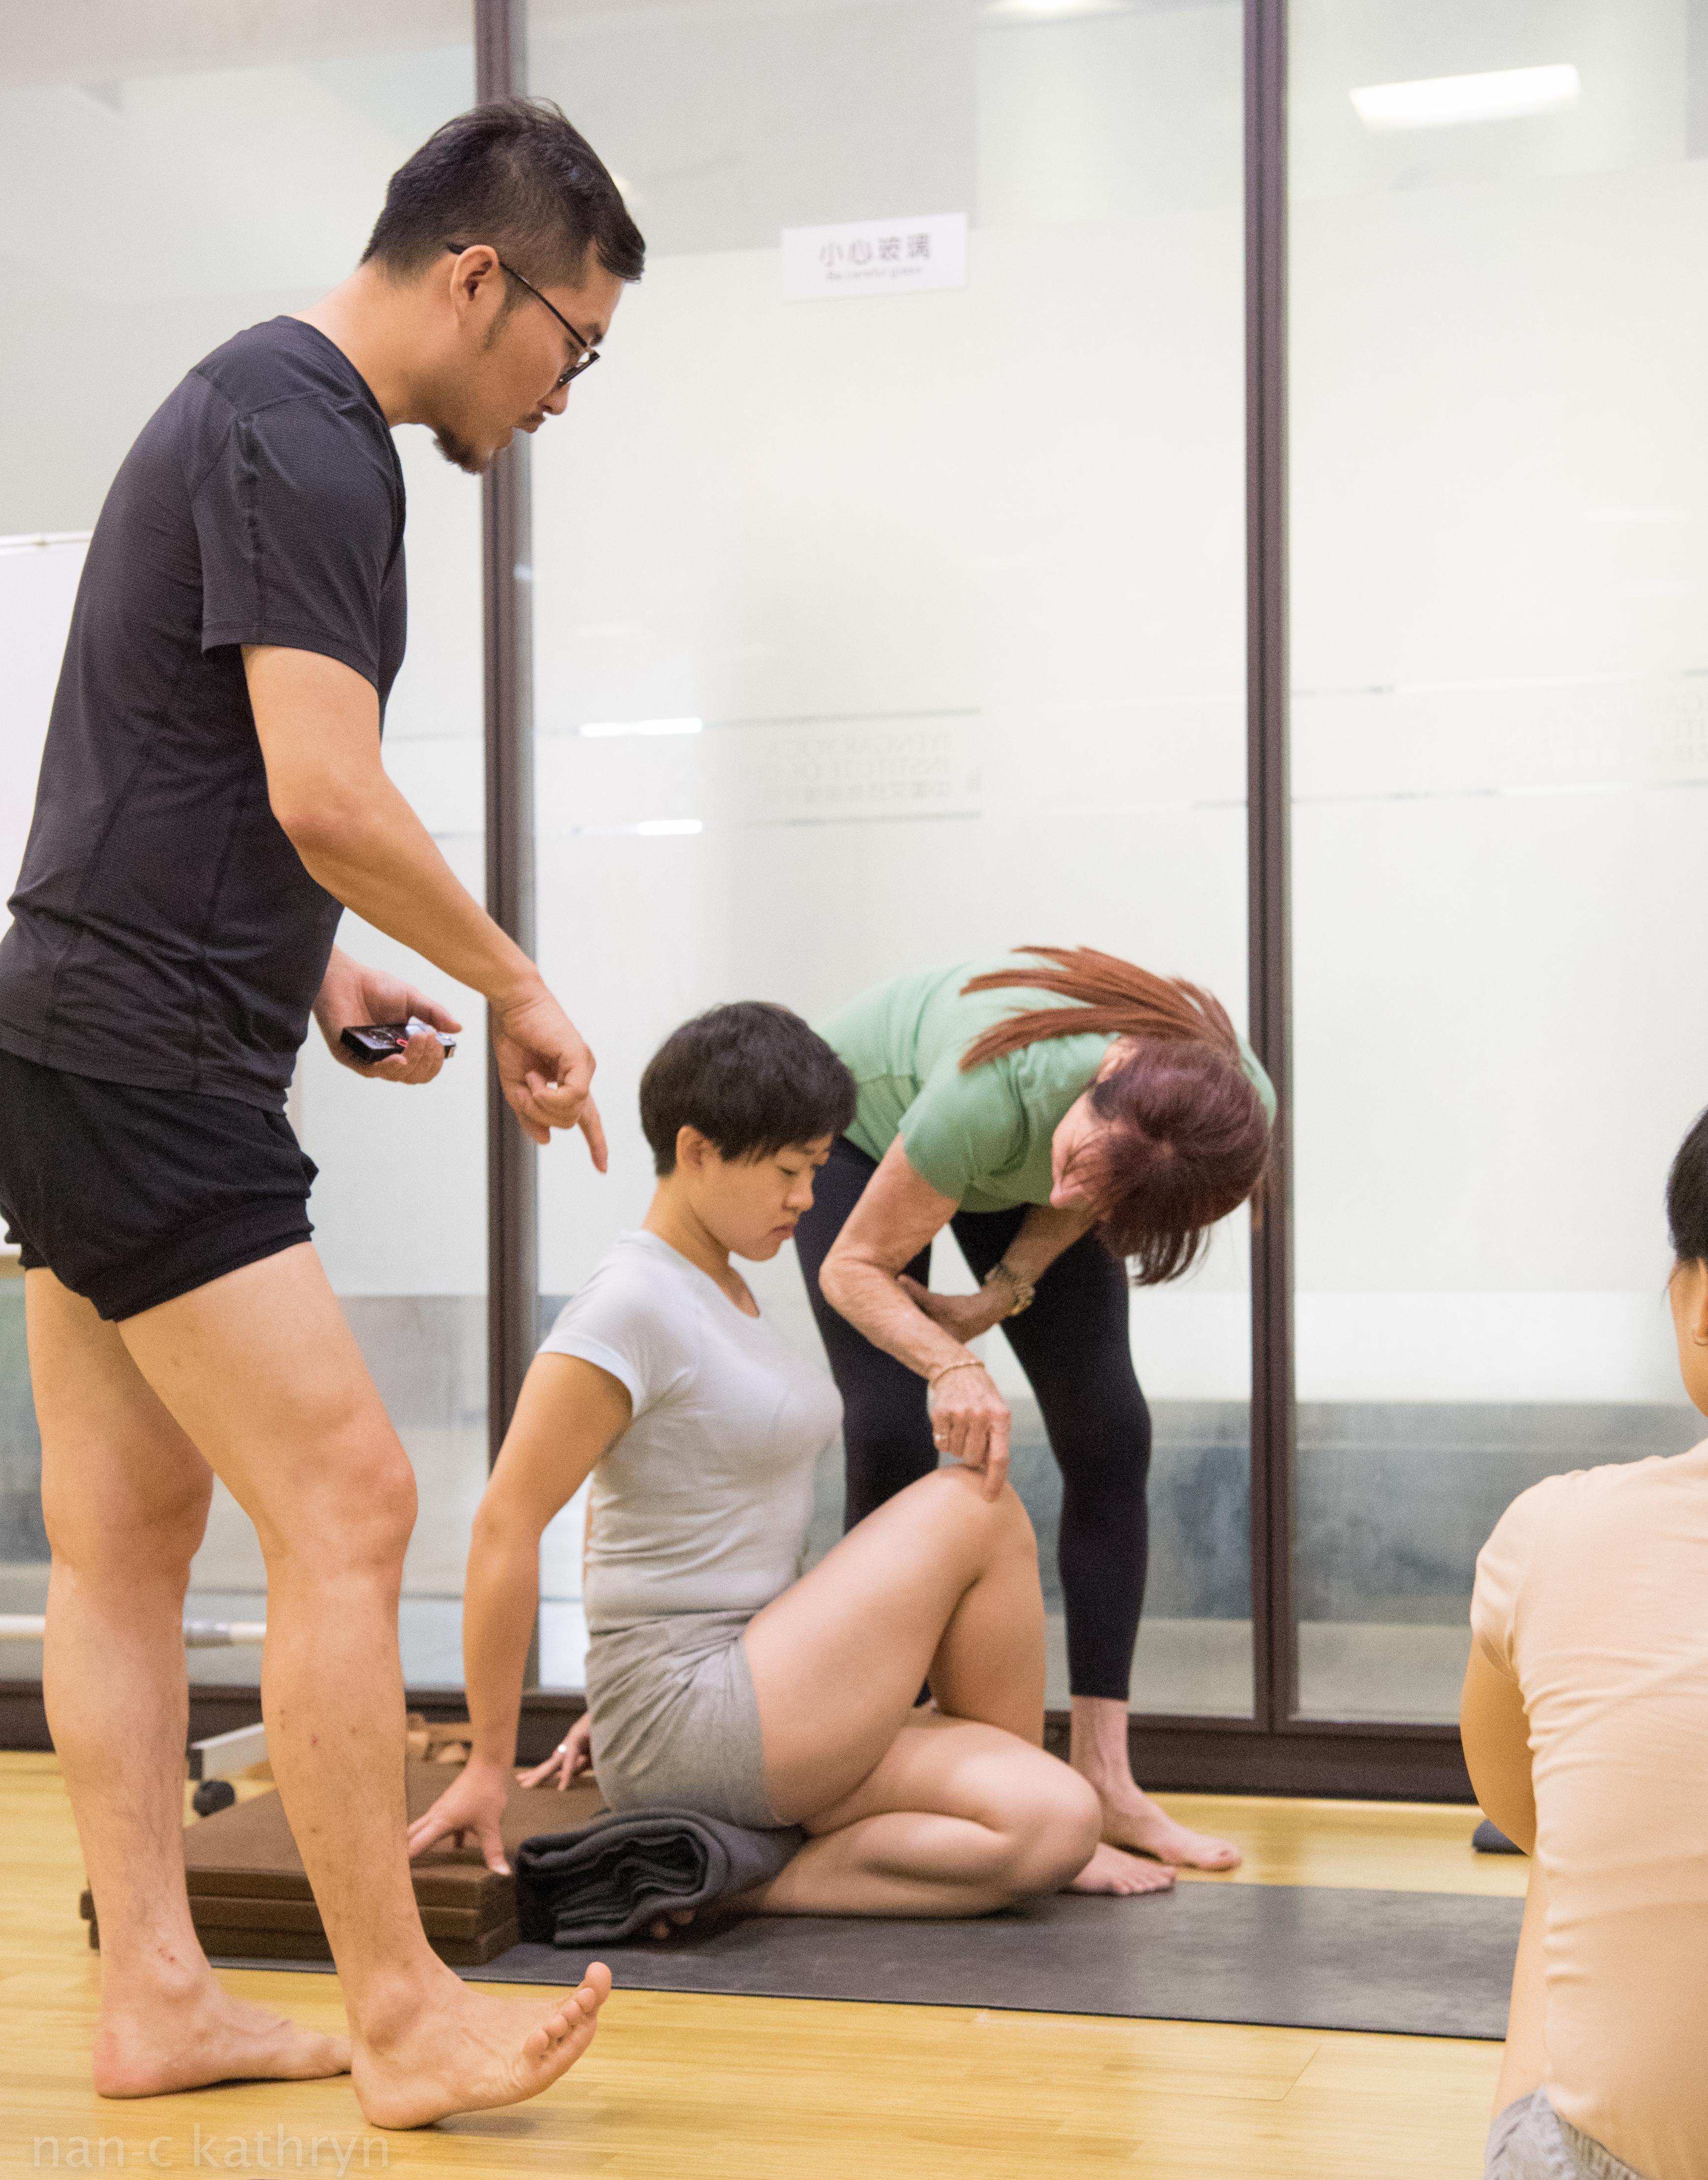 julie teaching demo with gloria-4905